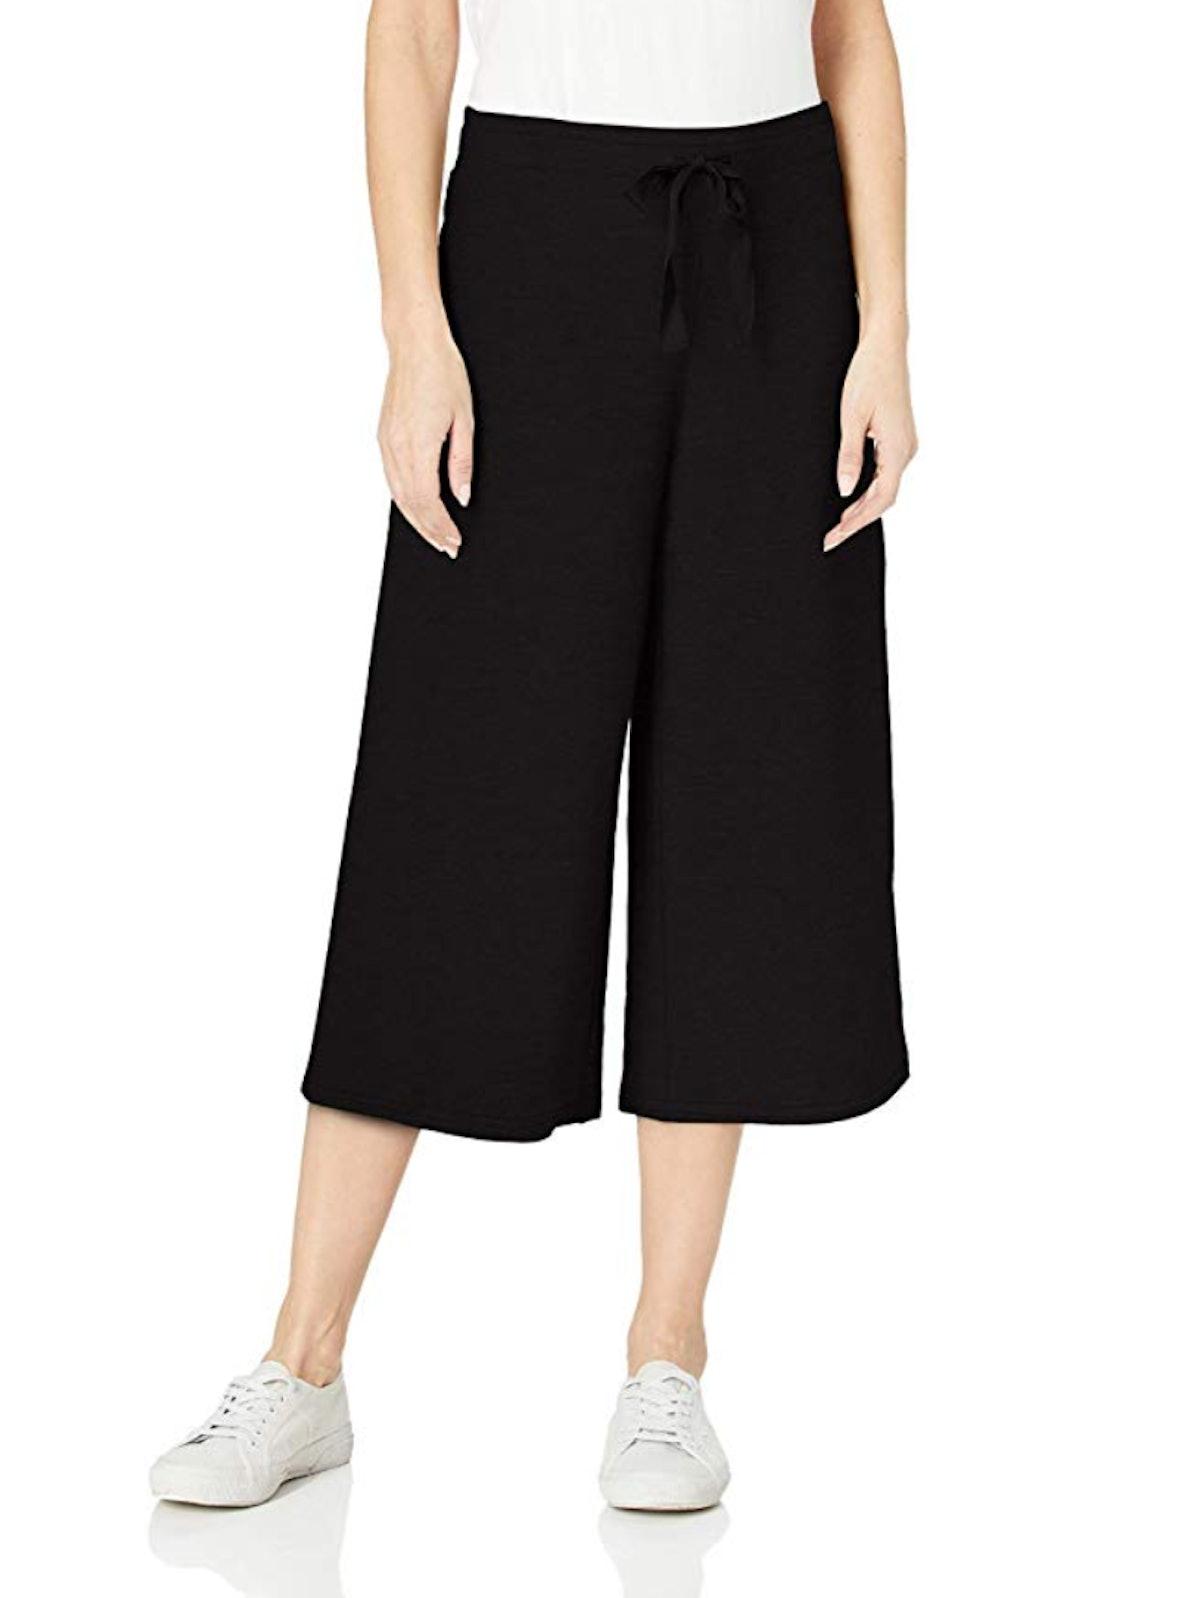 Daily Ritual Modal Culotte Pant